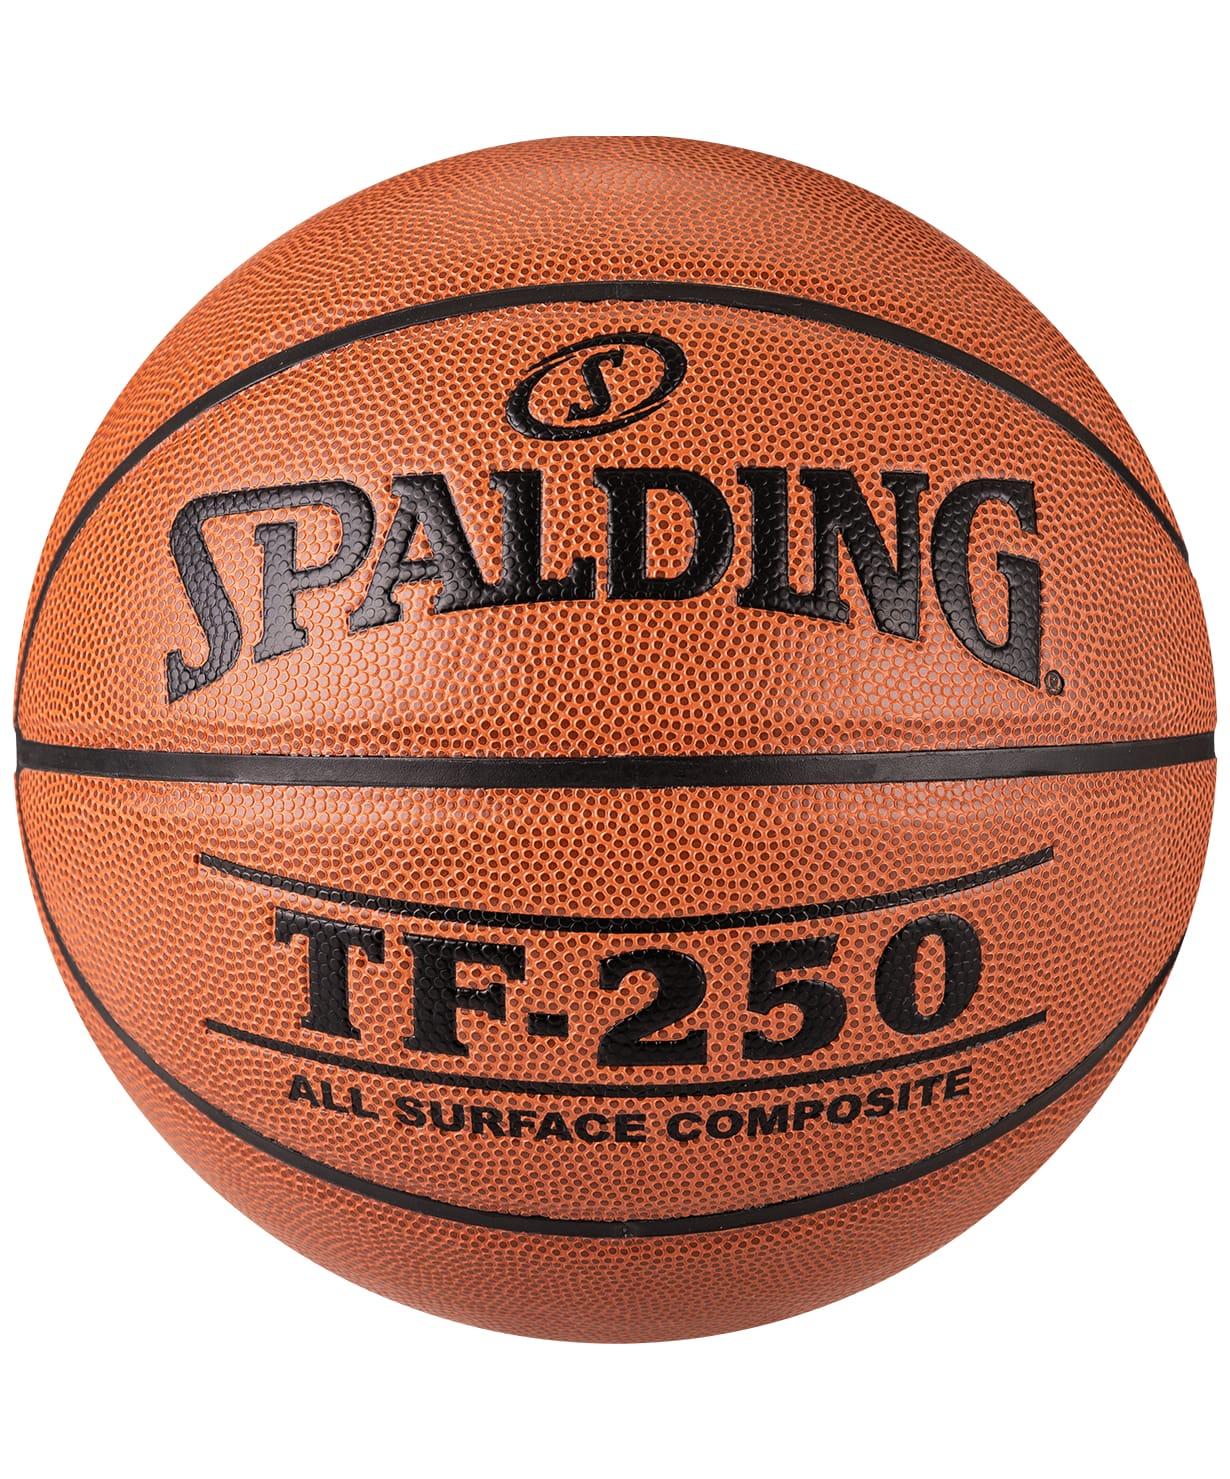 Мяч баскетбольный Spalding TF-250 №6 (74-532) баскетбольный мяч spalding 74 600y 74 600y 108 nba